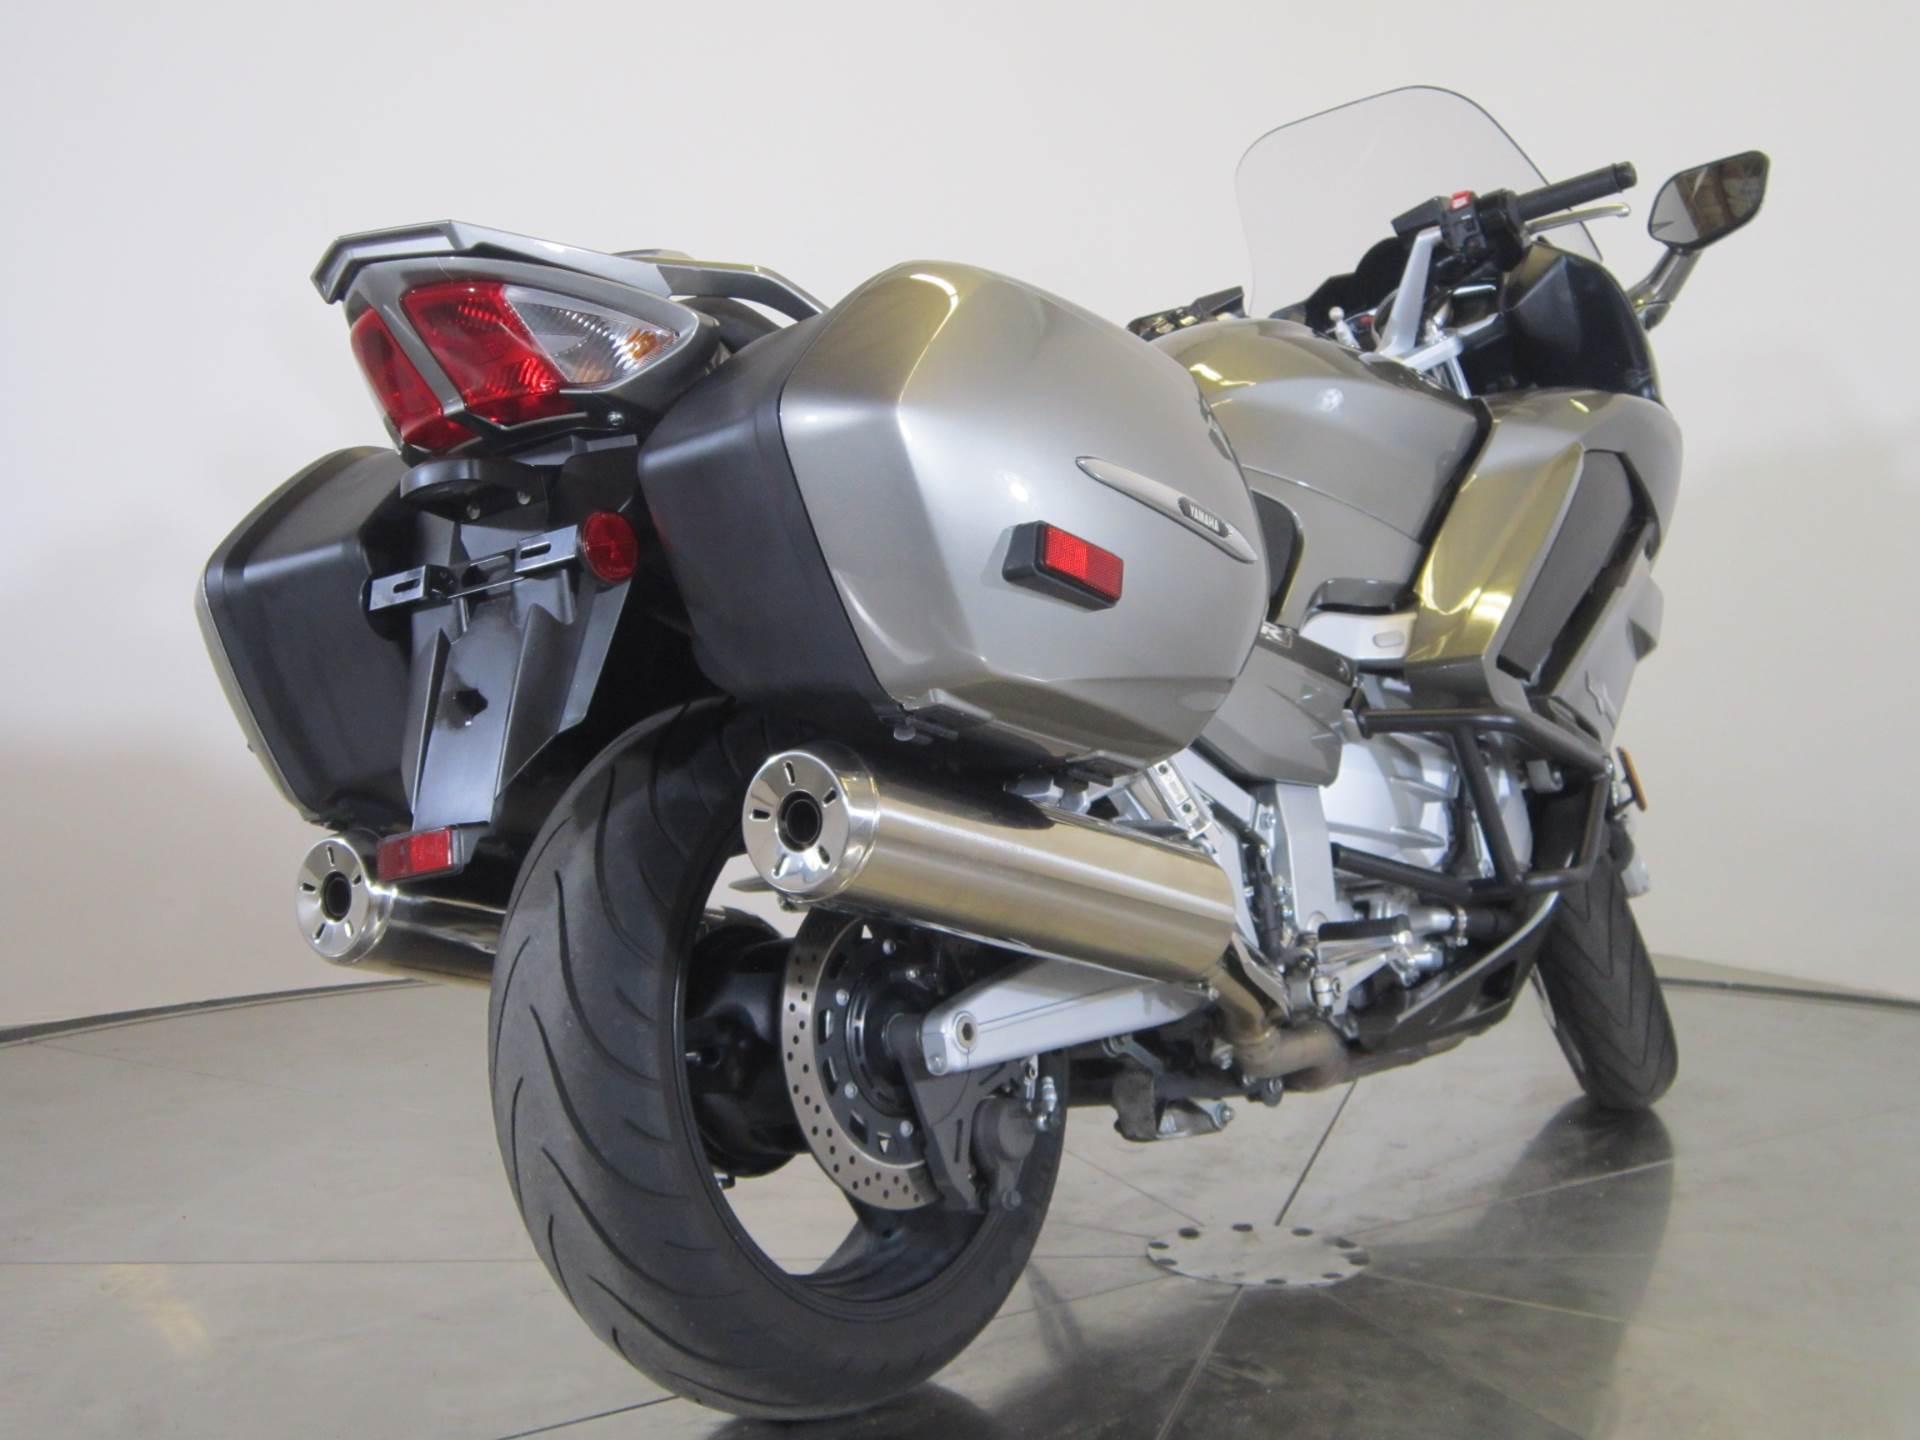 2013 Yamaha FJR1300A 5